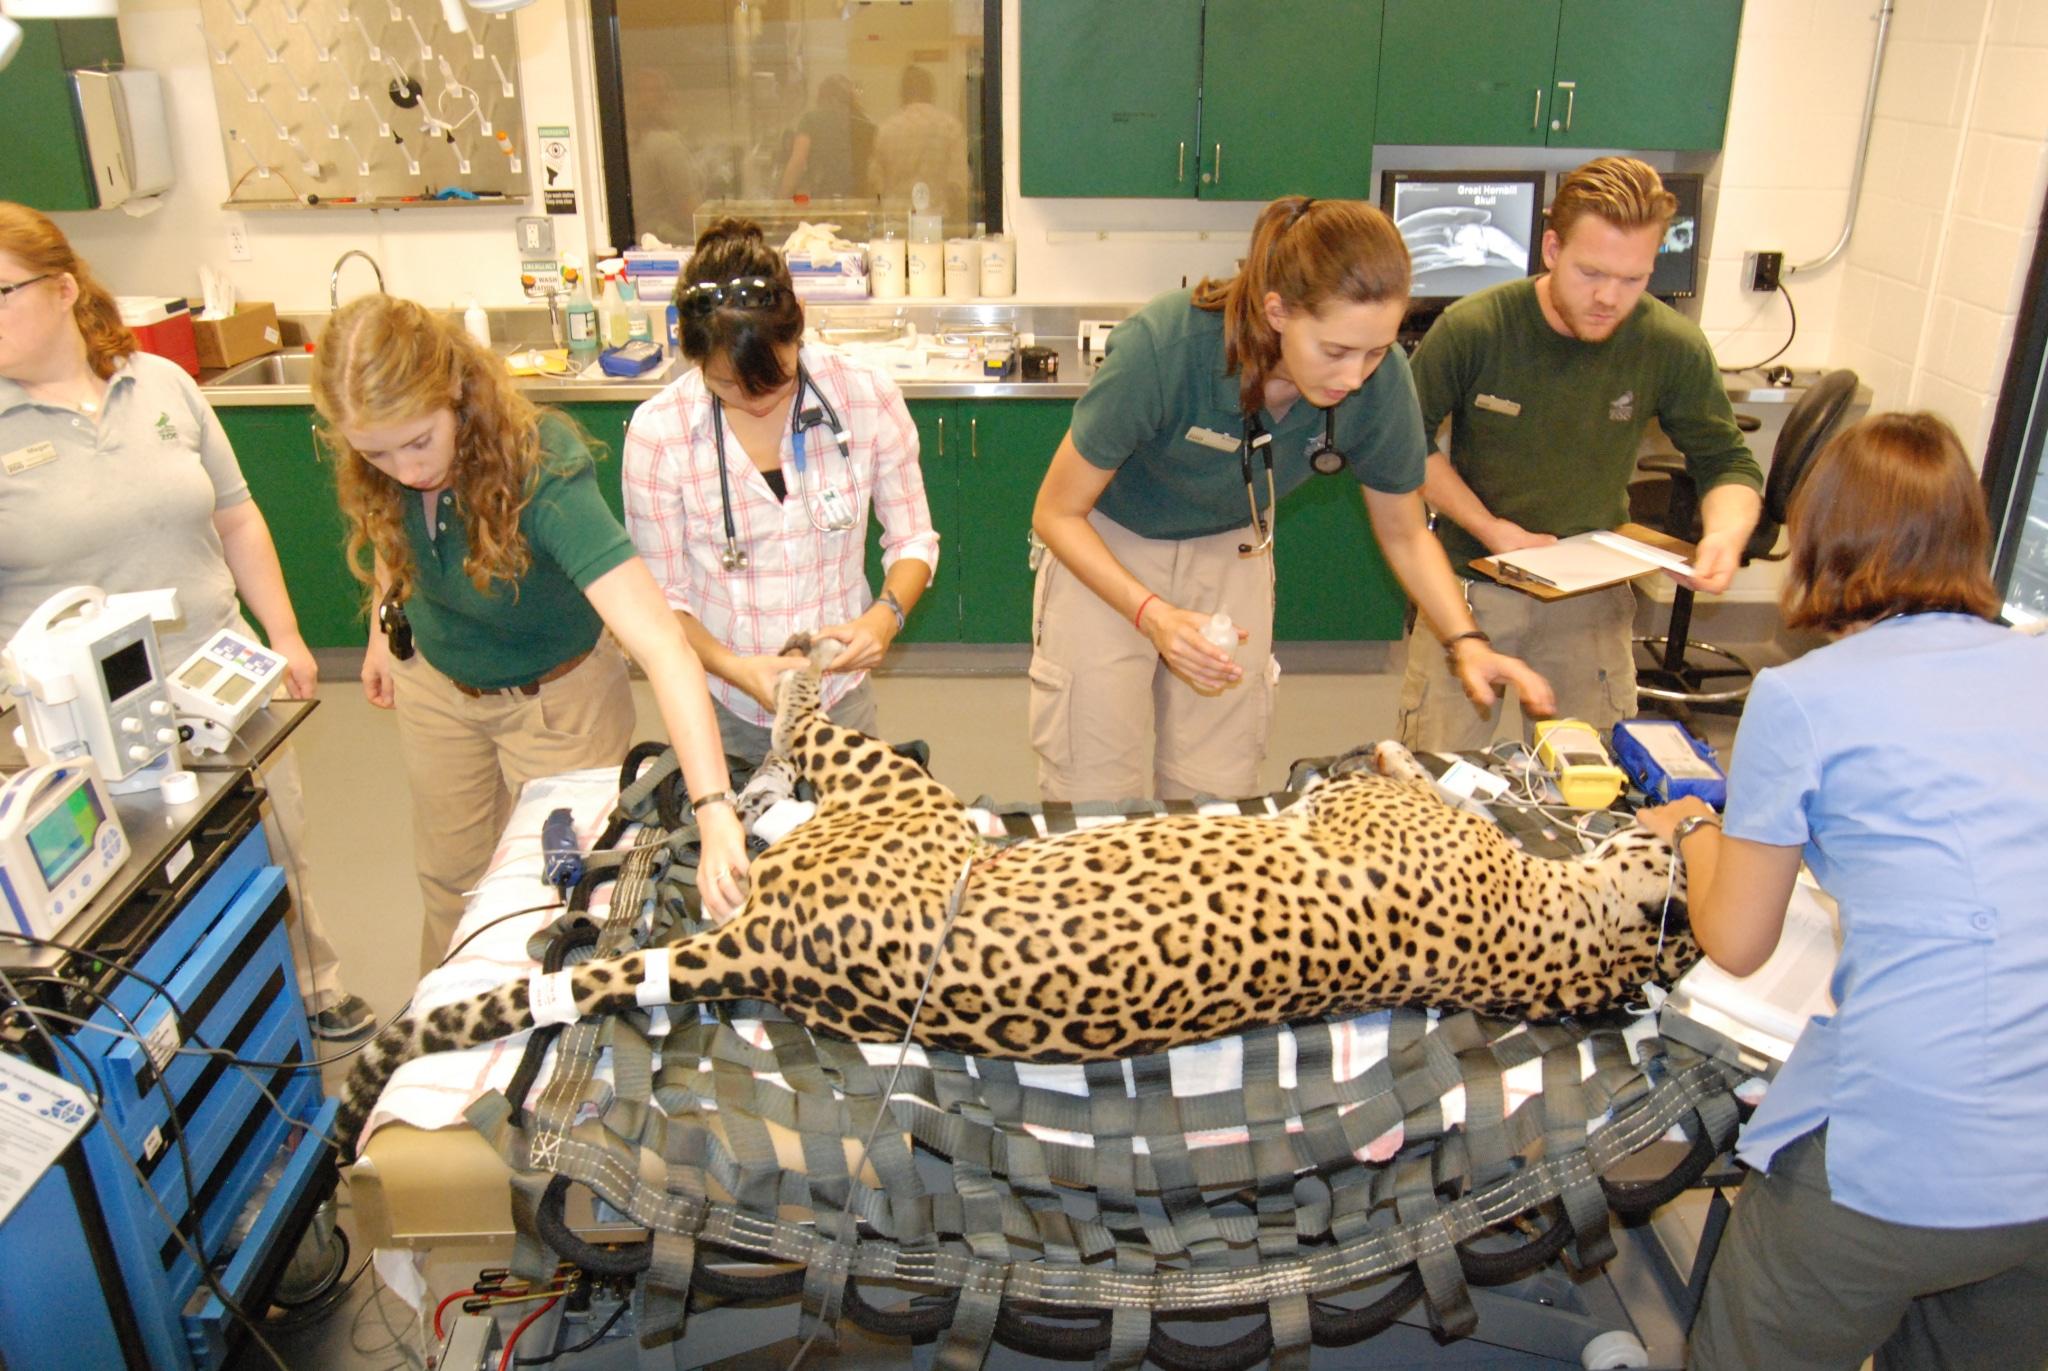 Jaguar Exam - Photo by Tonja Candelaria